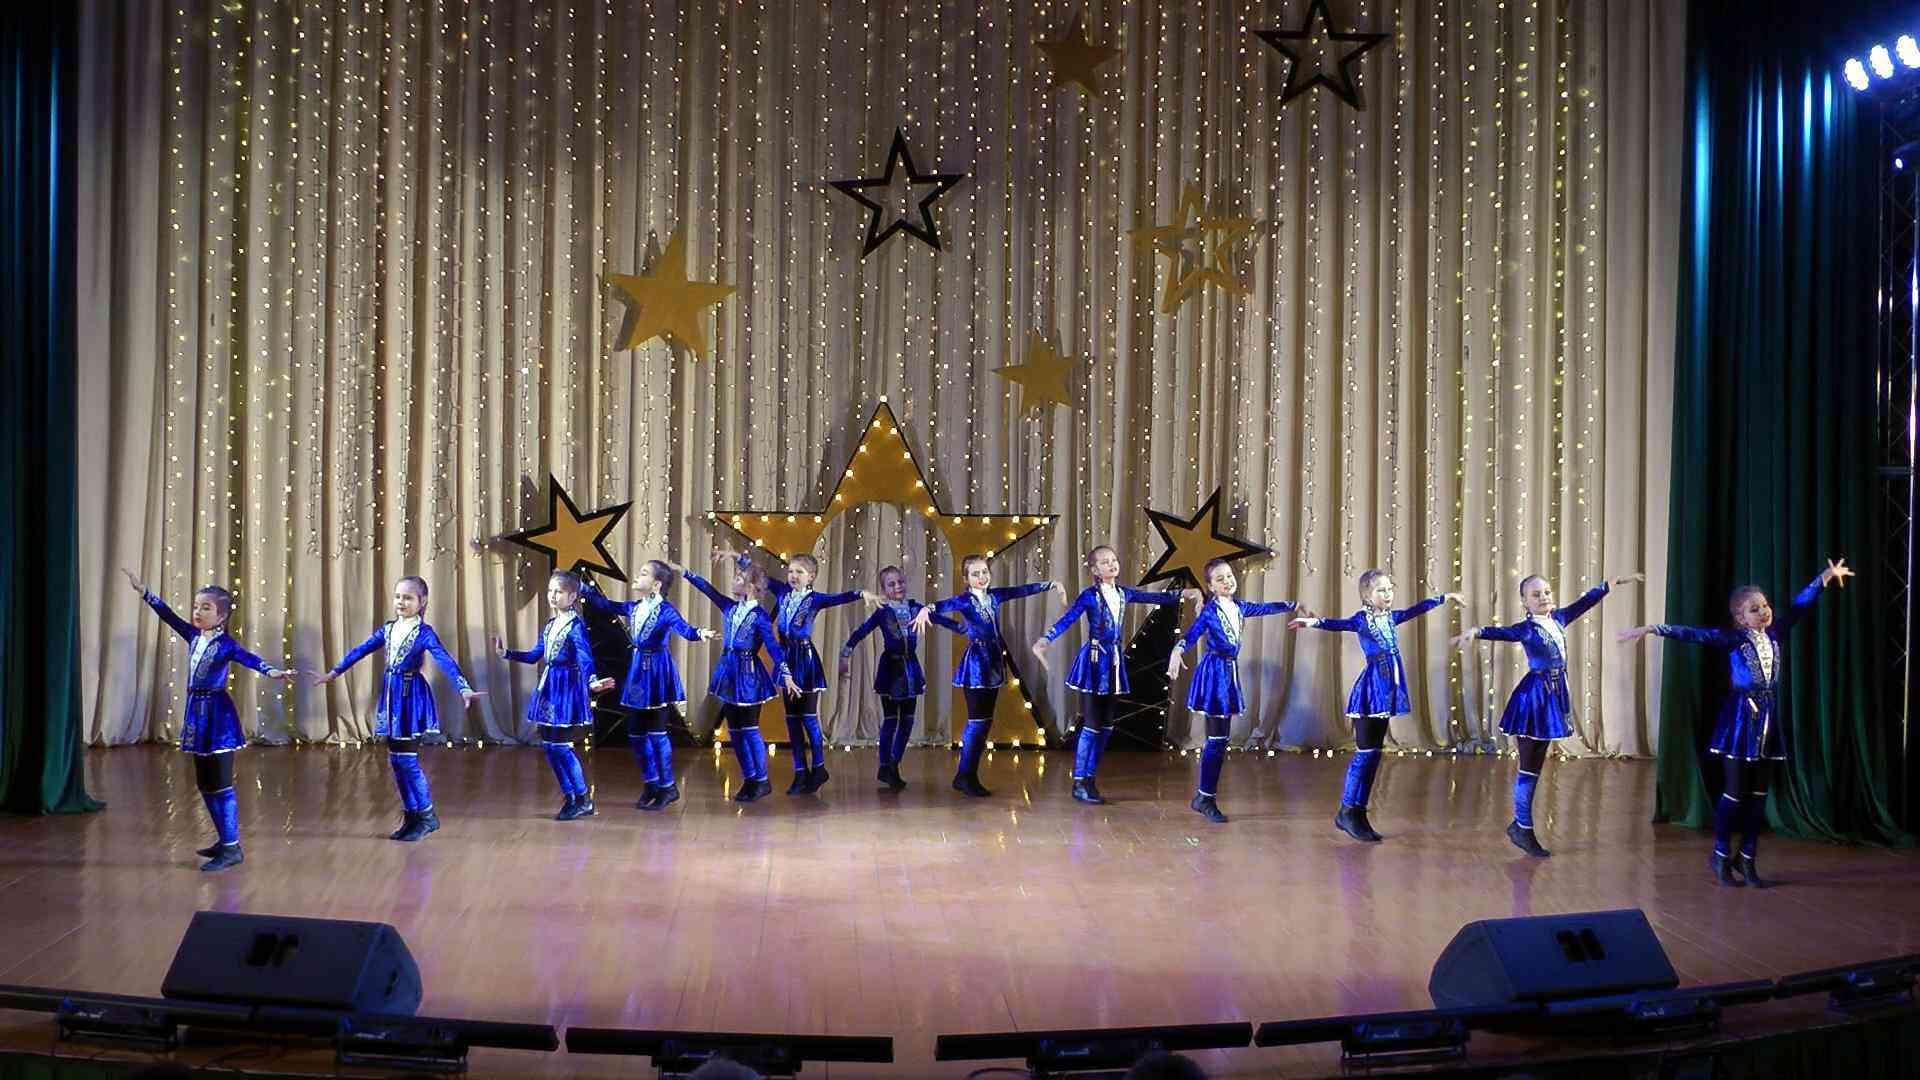 студия танца zara 2021 итоги года концерт